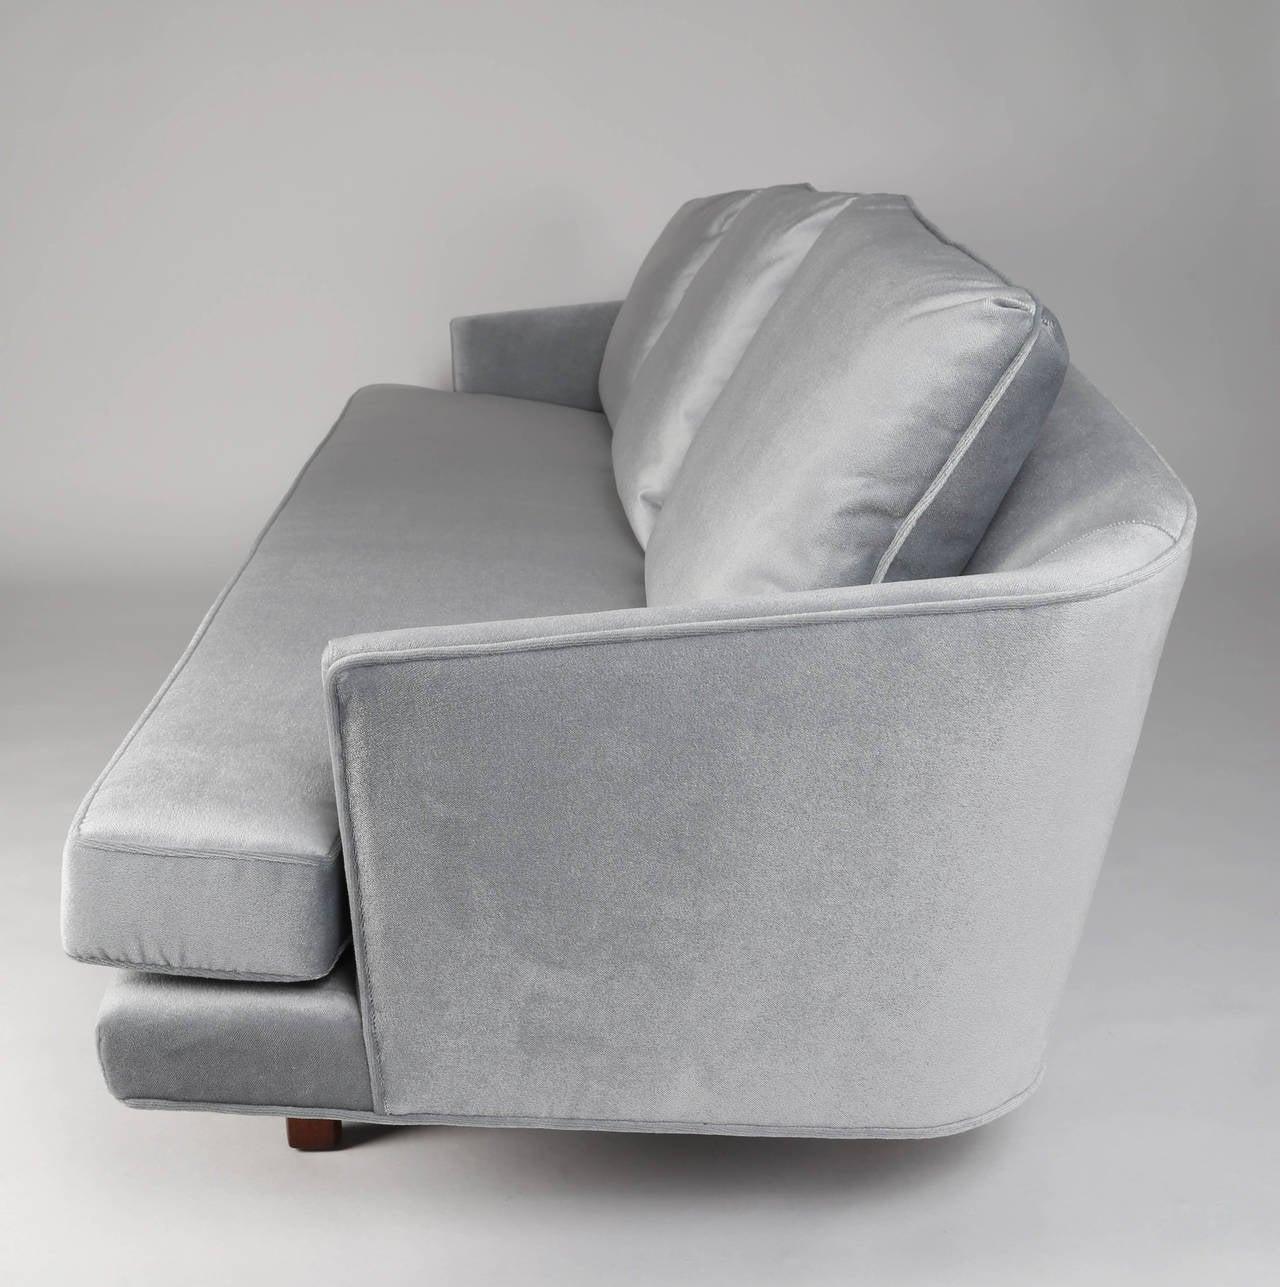 Curved Floating Sofa: 1950s Edward Wormley For Dunbar Curved-Back Sofa On